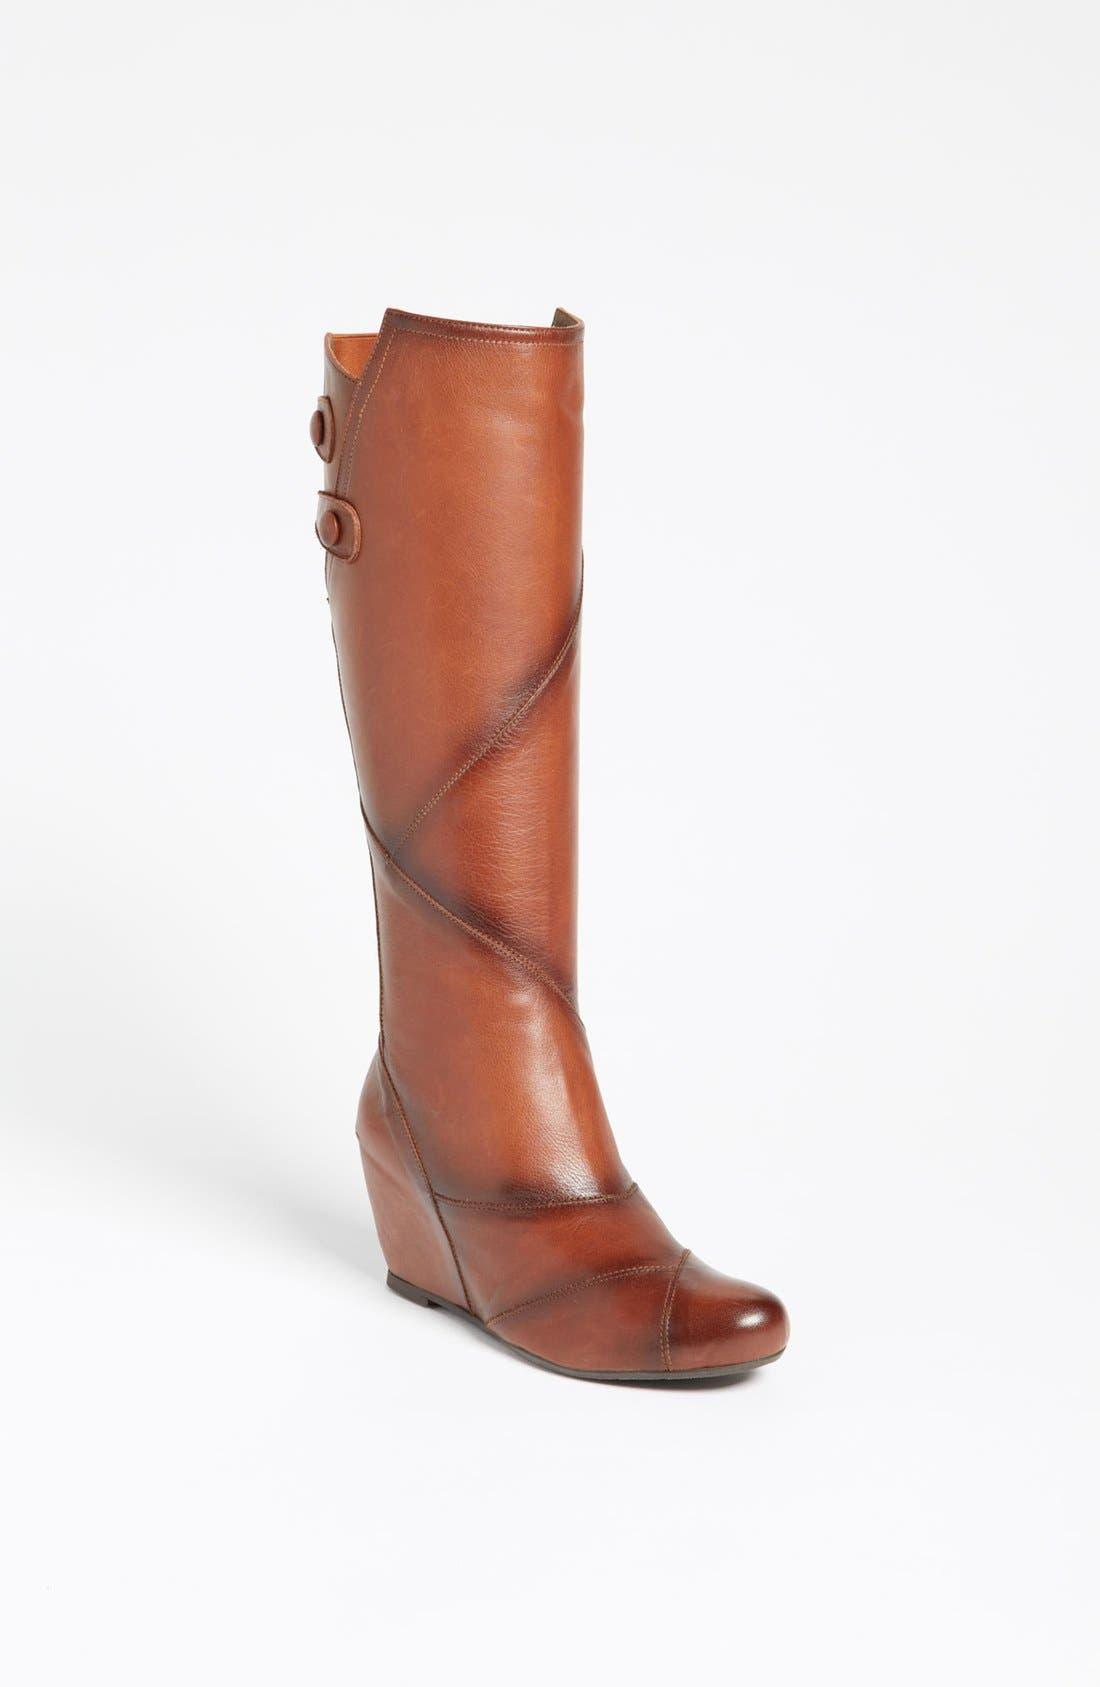 Alternate Image 1 Selected - Miz Mooz 'West' Boot